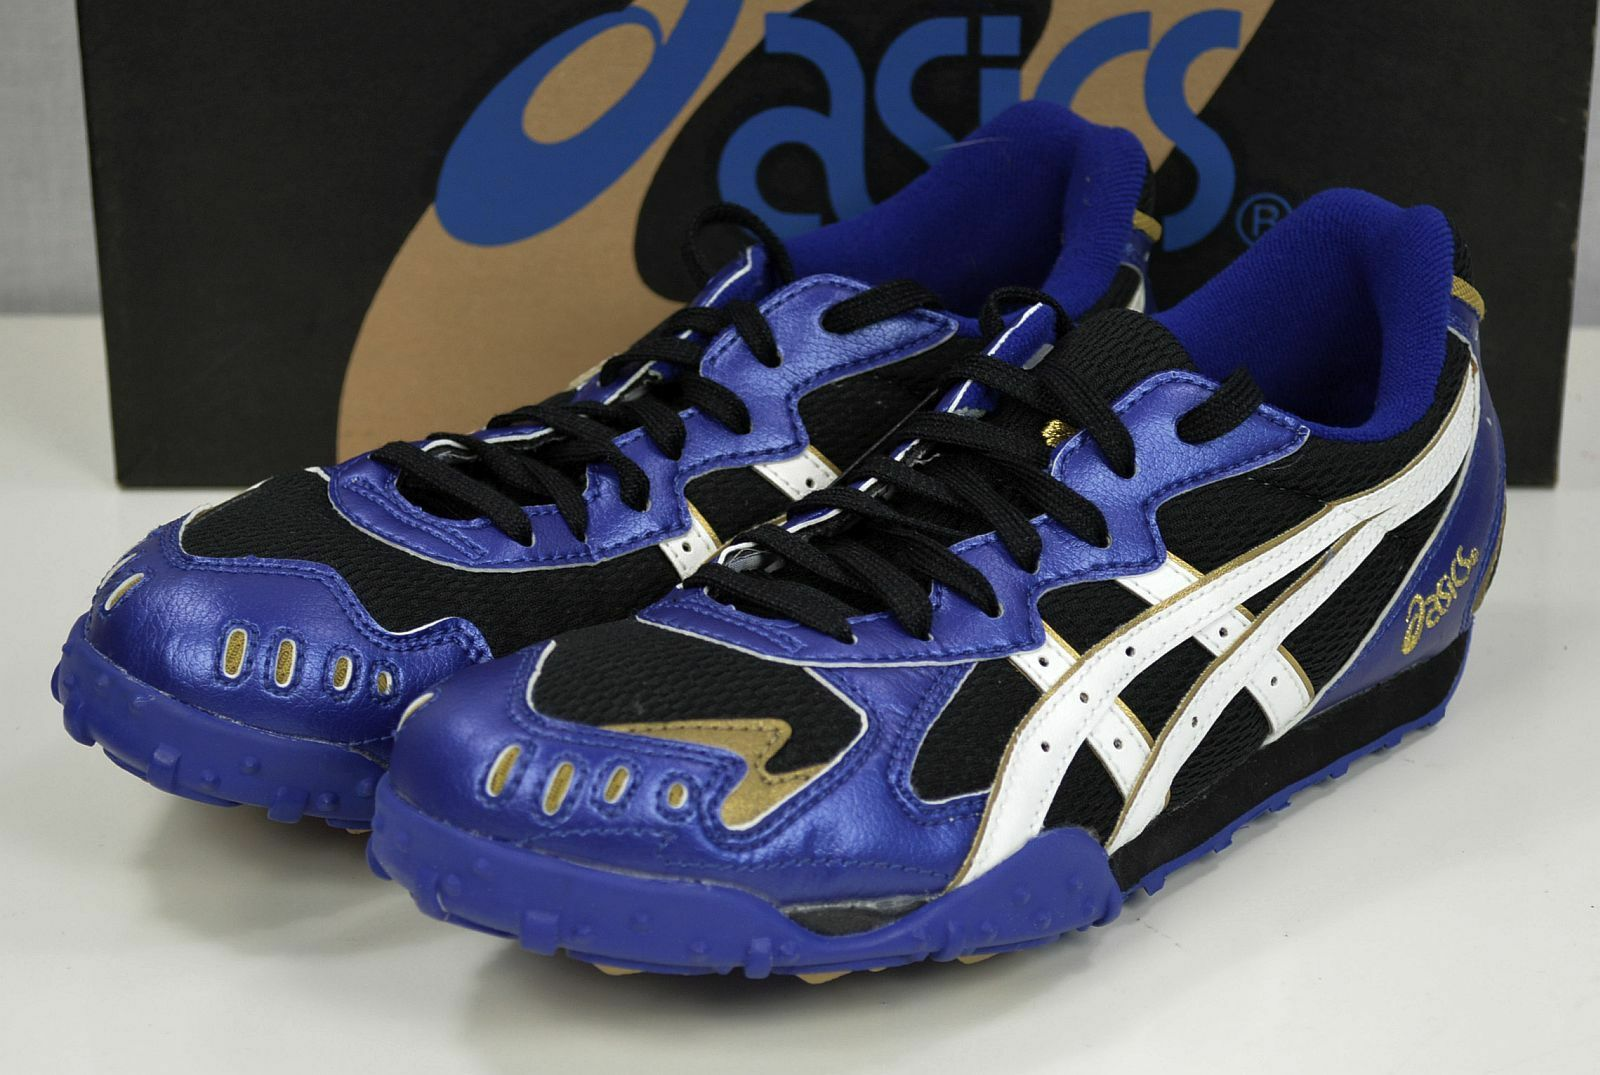 Asics Pro-Country Laufschuhe EU 40,5 Sportschuhe Herren Schuhe sale 47061702